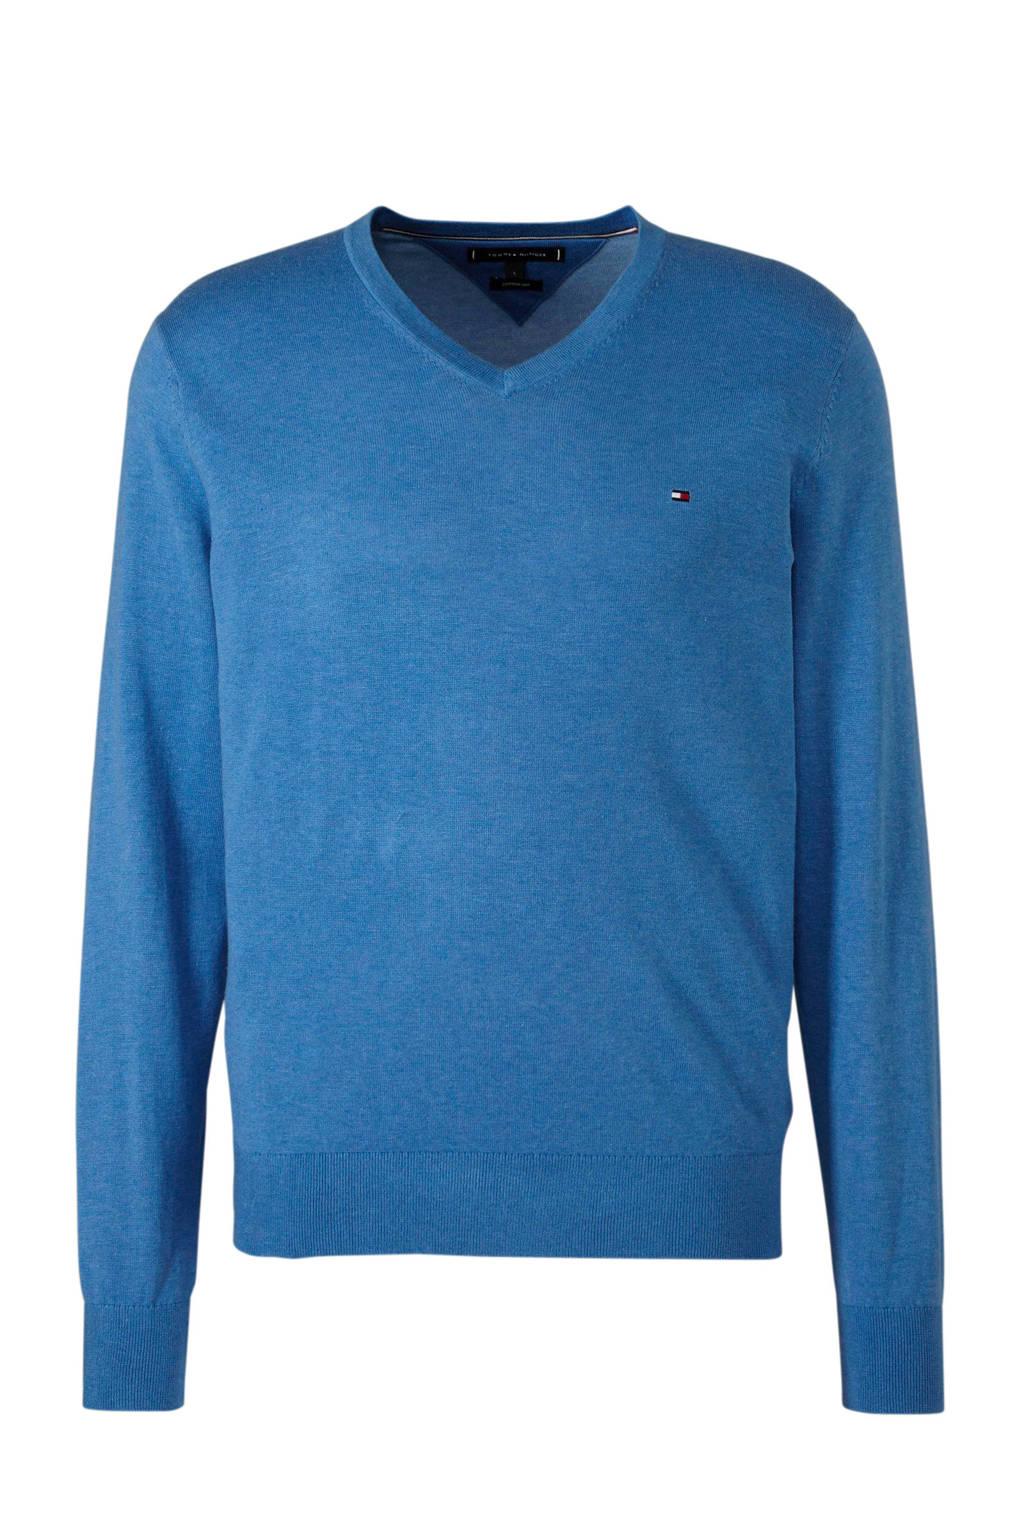 Tommy Hilfiger gemêleerde trui blauw, Blauw